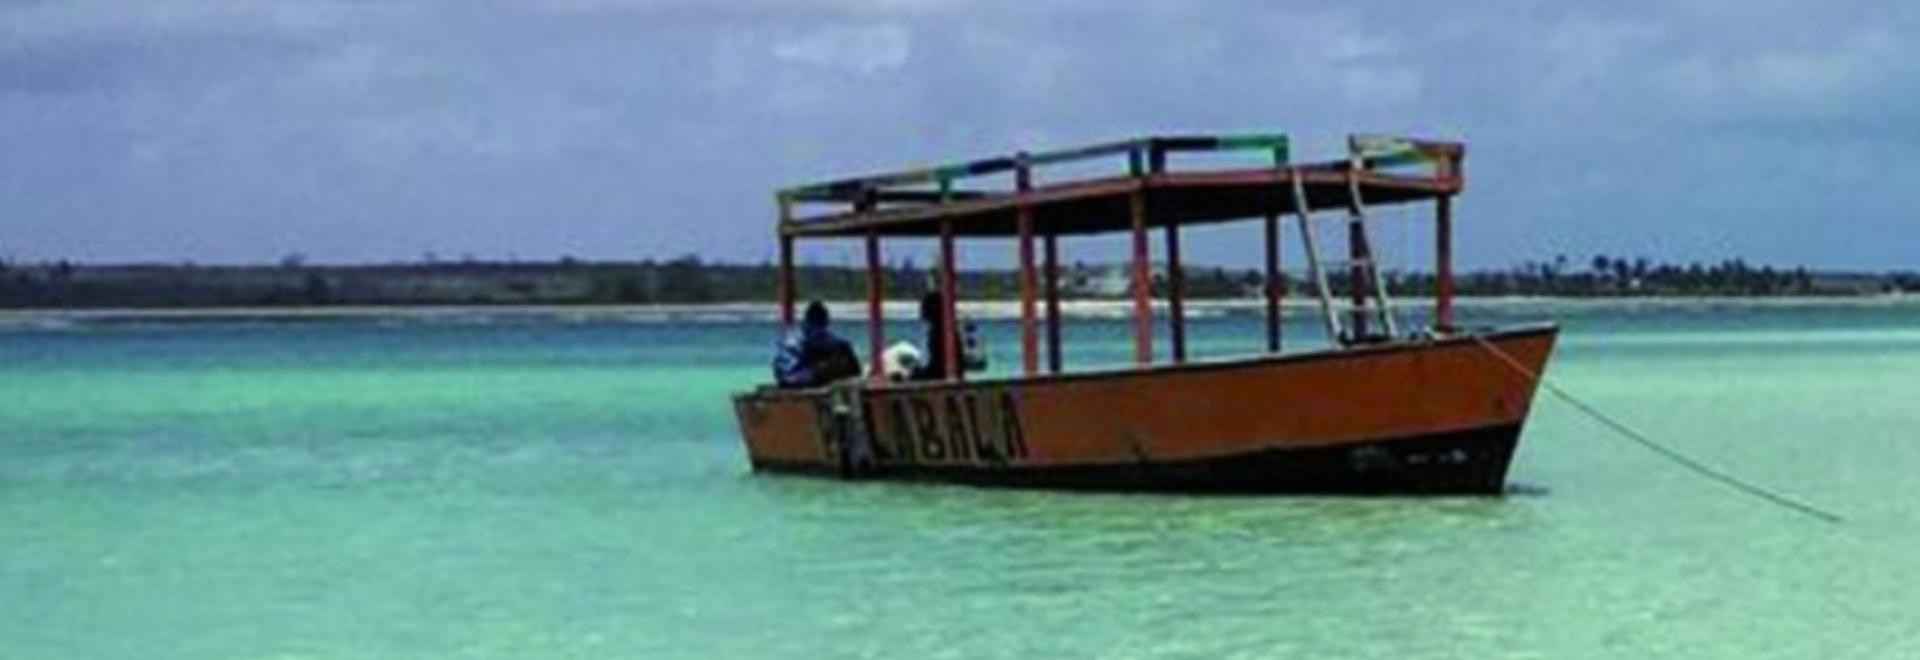 Ischia, l'isola verde